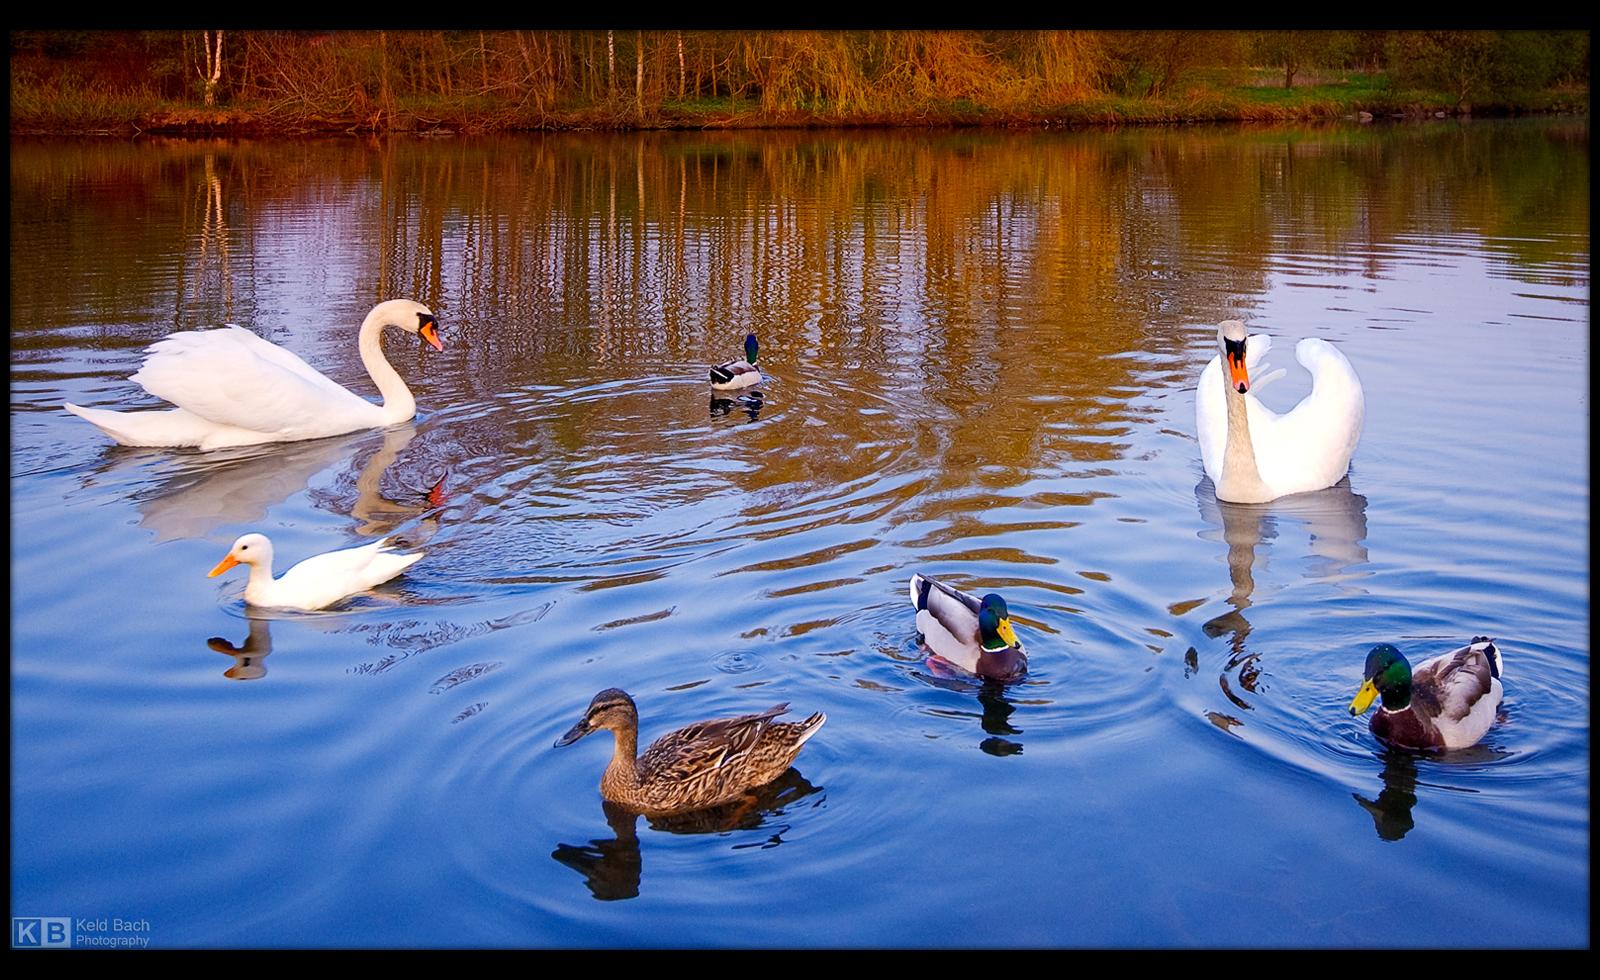 Chasing the Ducks by KeldBach